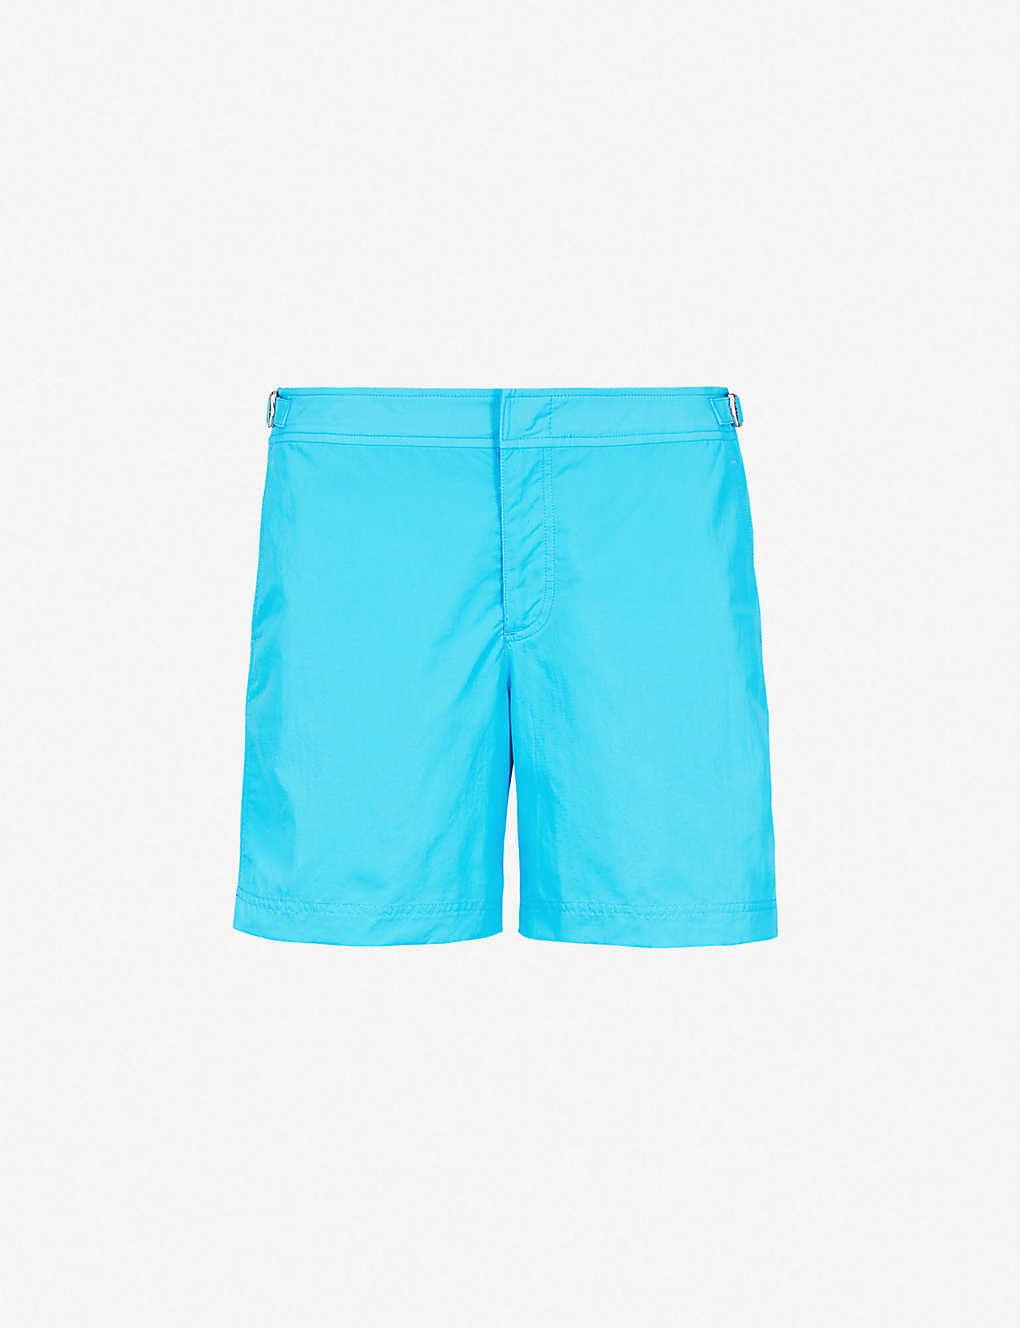 294560eaea ORLEBAR BROWN - Bulldog relaxed-fit swim shorts | Selfridges.com